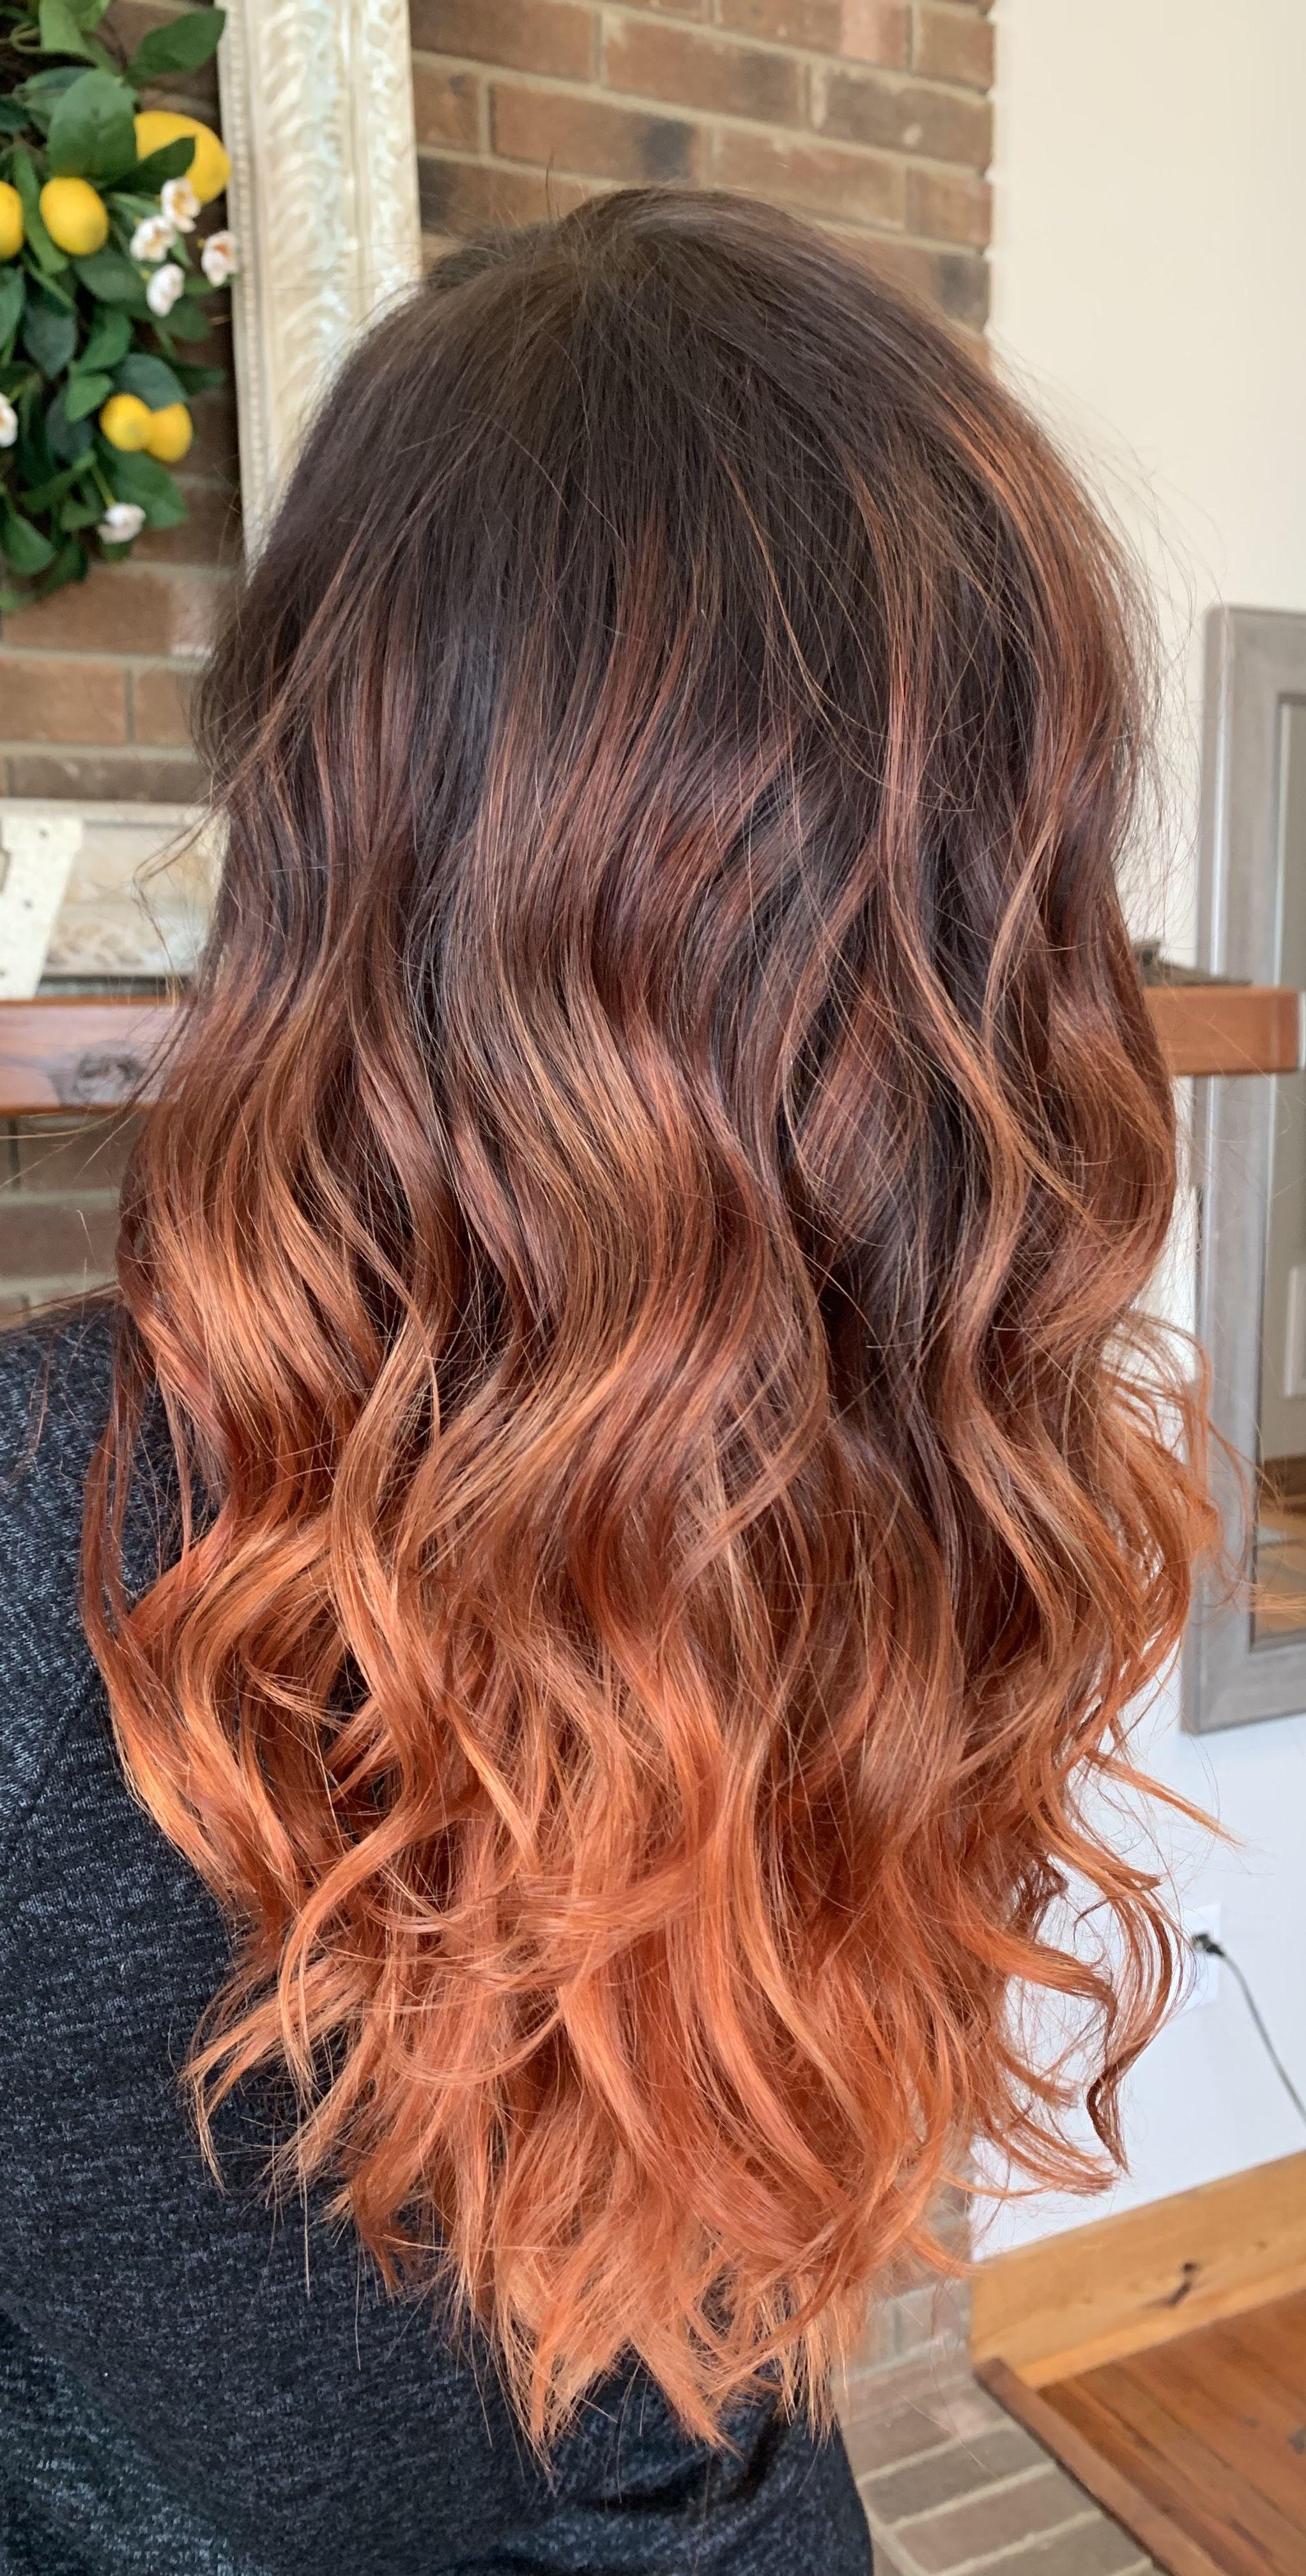 Gioia Difiaba Balayage Hair Copper Balayage Straight Hair Orange Ombre Hair